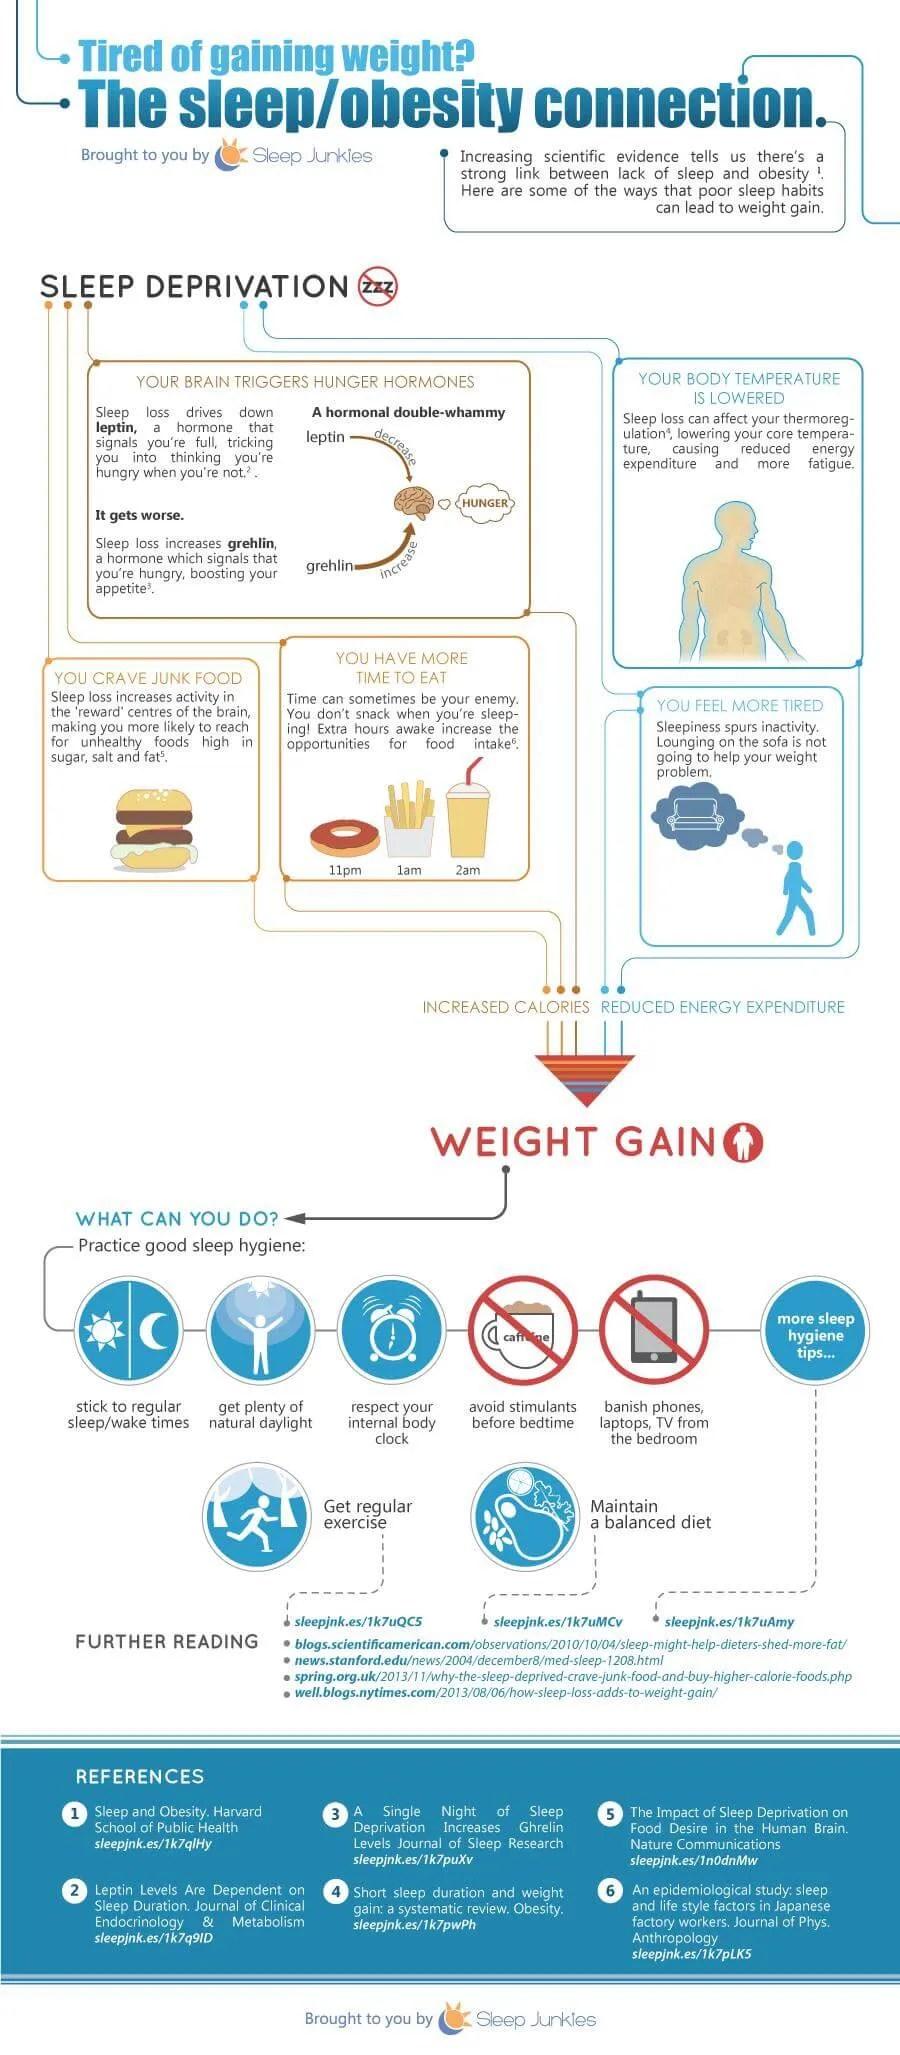 Sleep Junkies Tired of gaining weight infographic